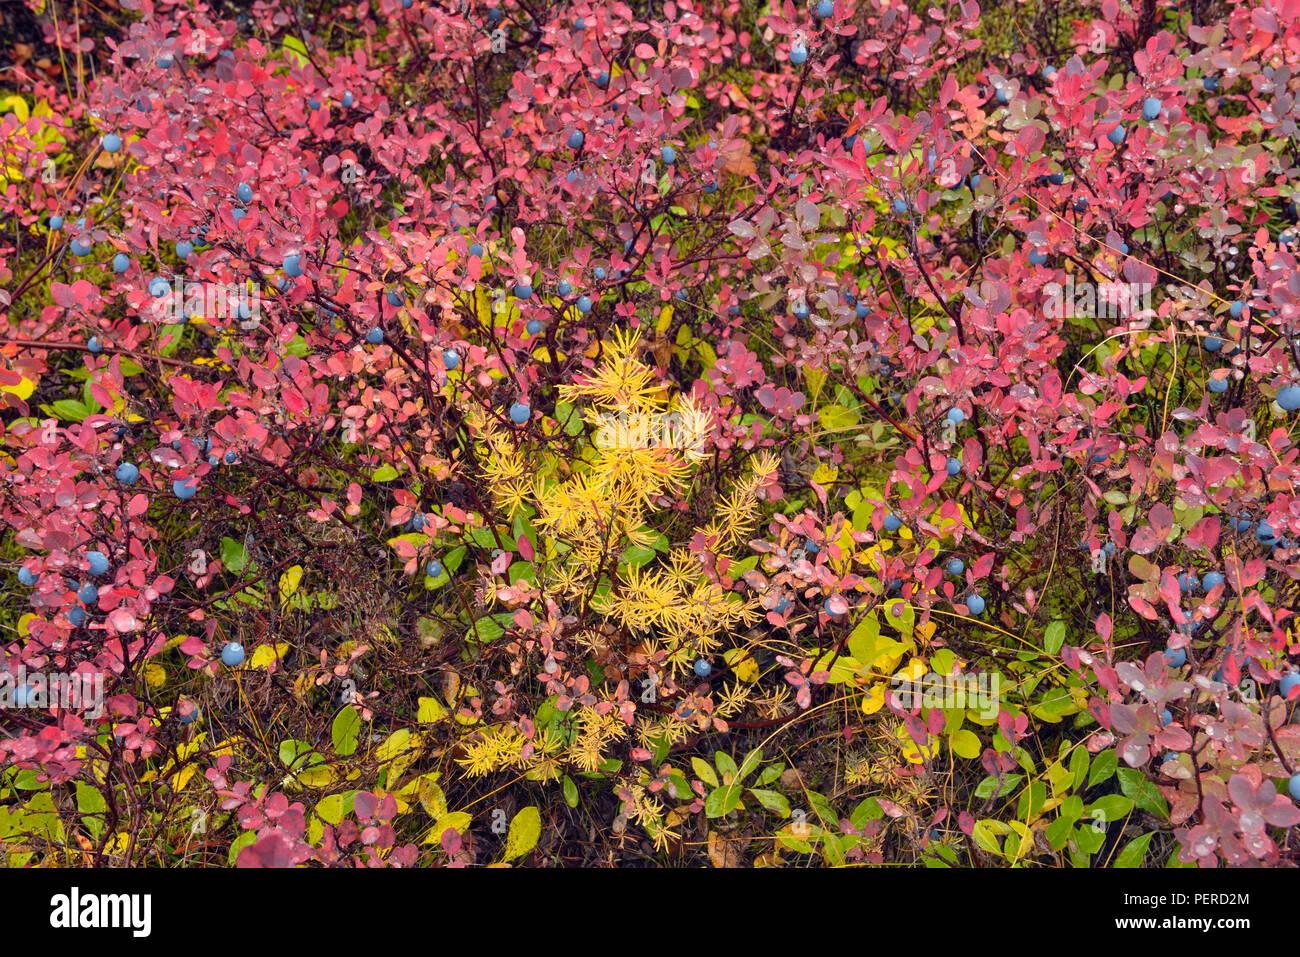 Barrenground vegetation in autumn near Ennadai Lake- larch, blueberry, Arctic Haven Lodge, Ennadai Lake, Nunavut Territory, Canada - Stock Image